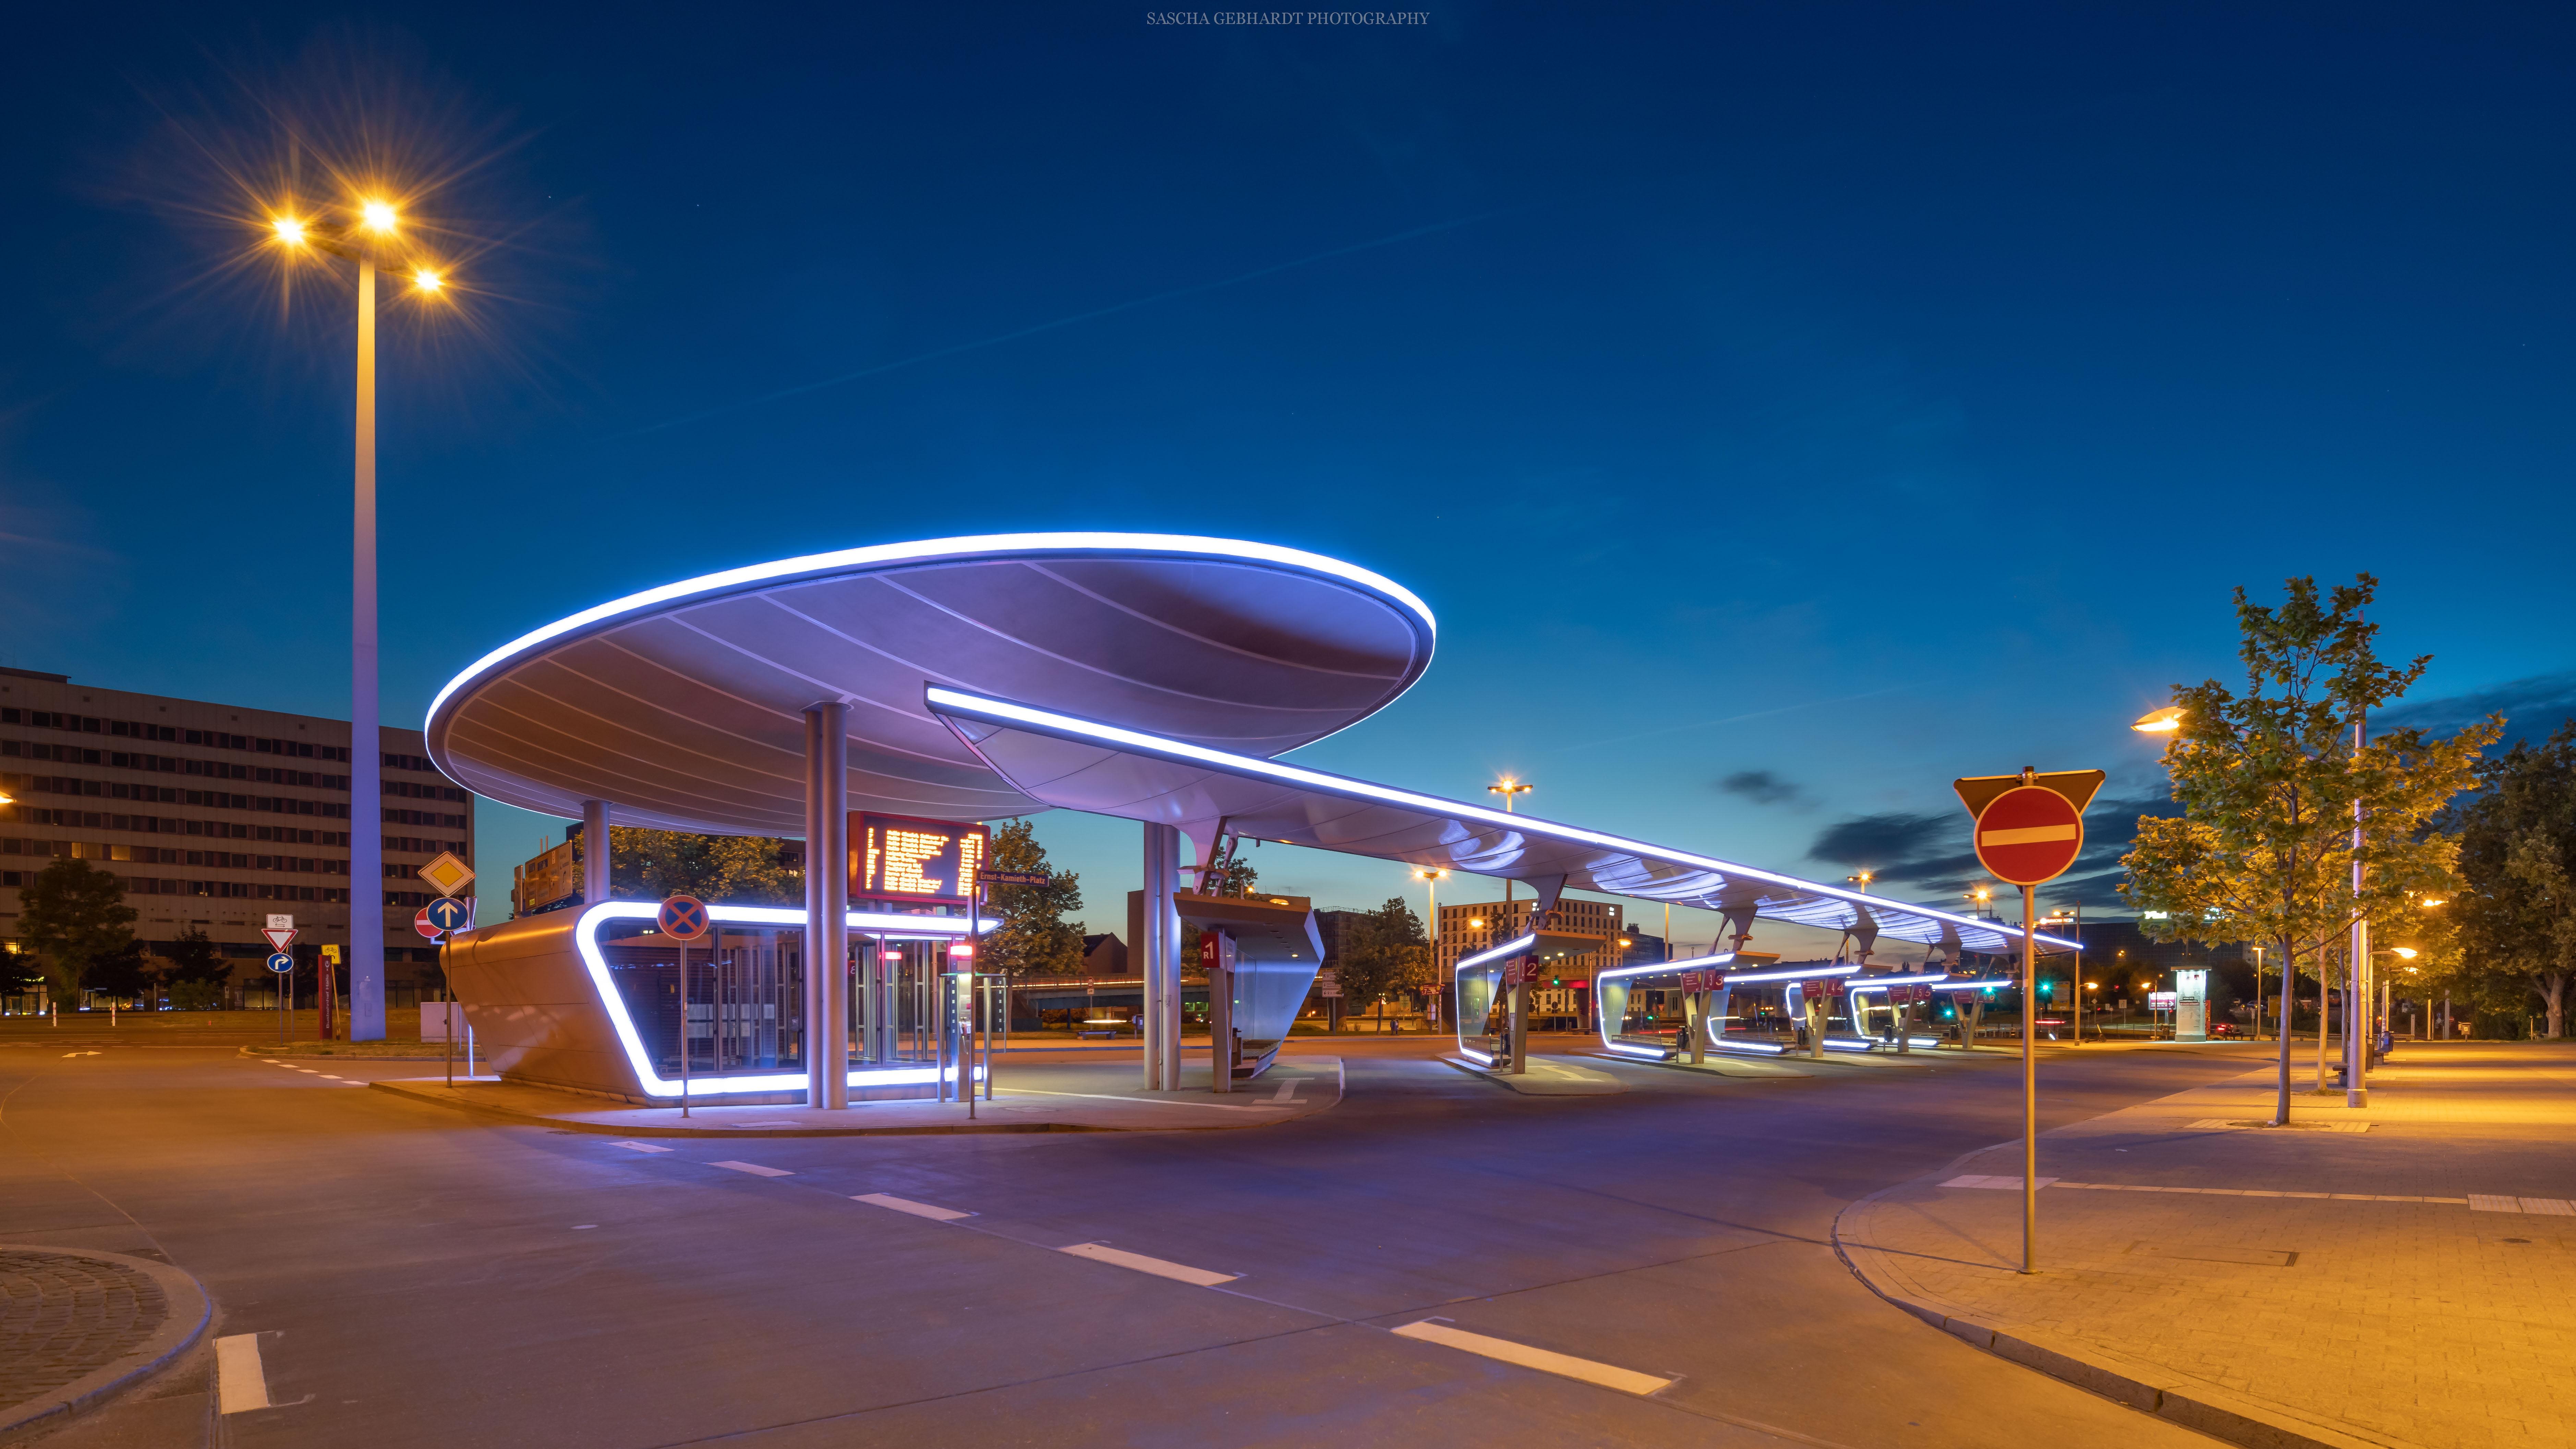 Busbahnhof Halle